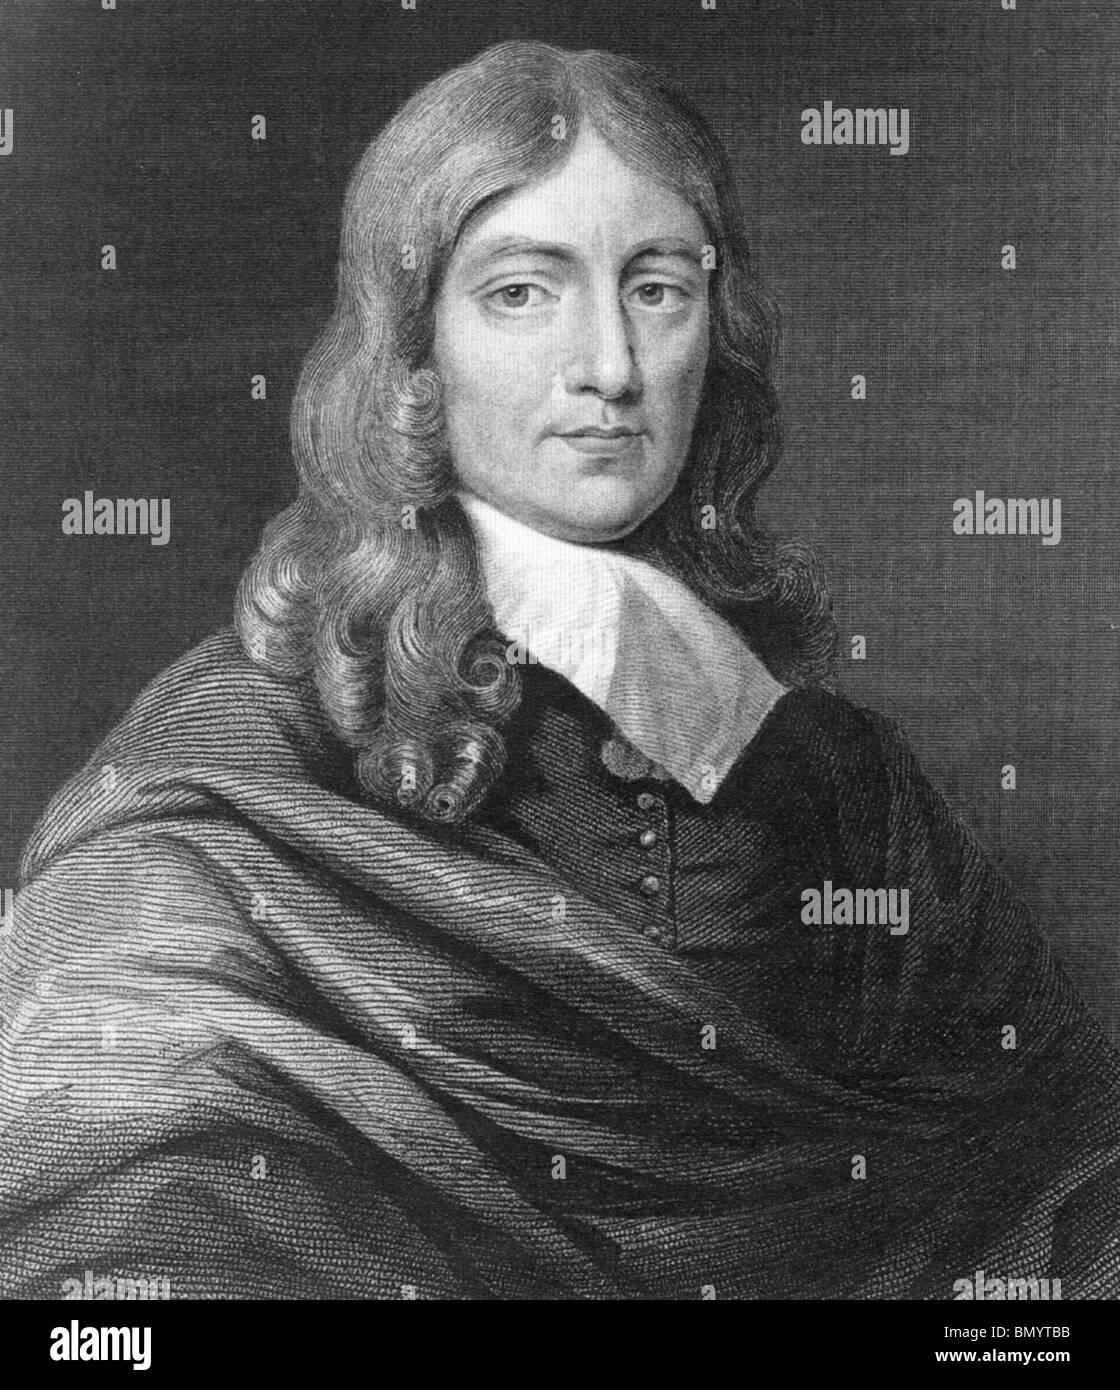 JOHN MILTON - English poet (1608-1674) - Stock Image